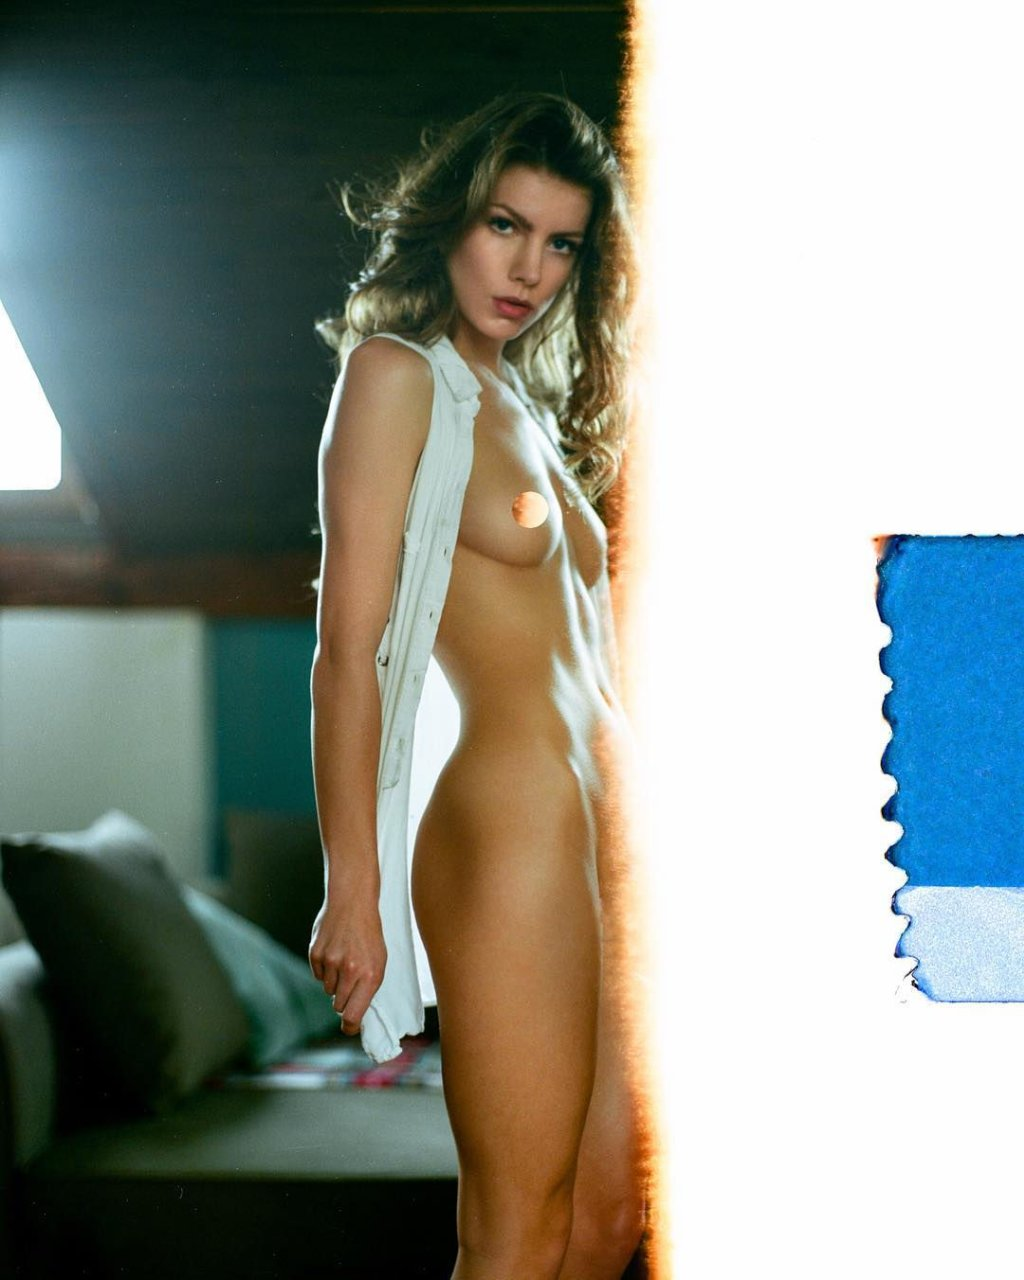 Angela pitts nude pics